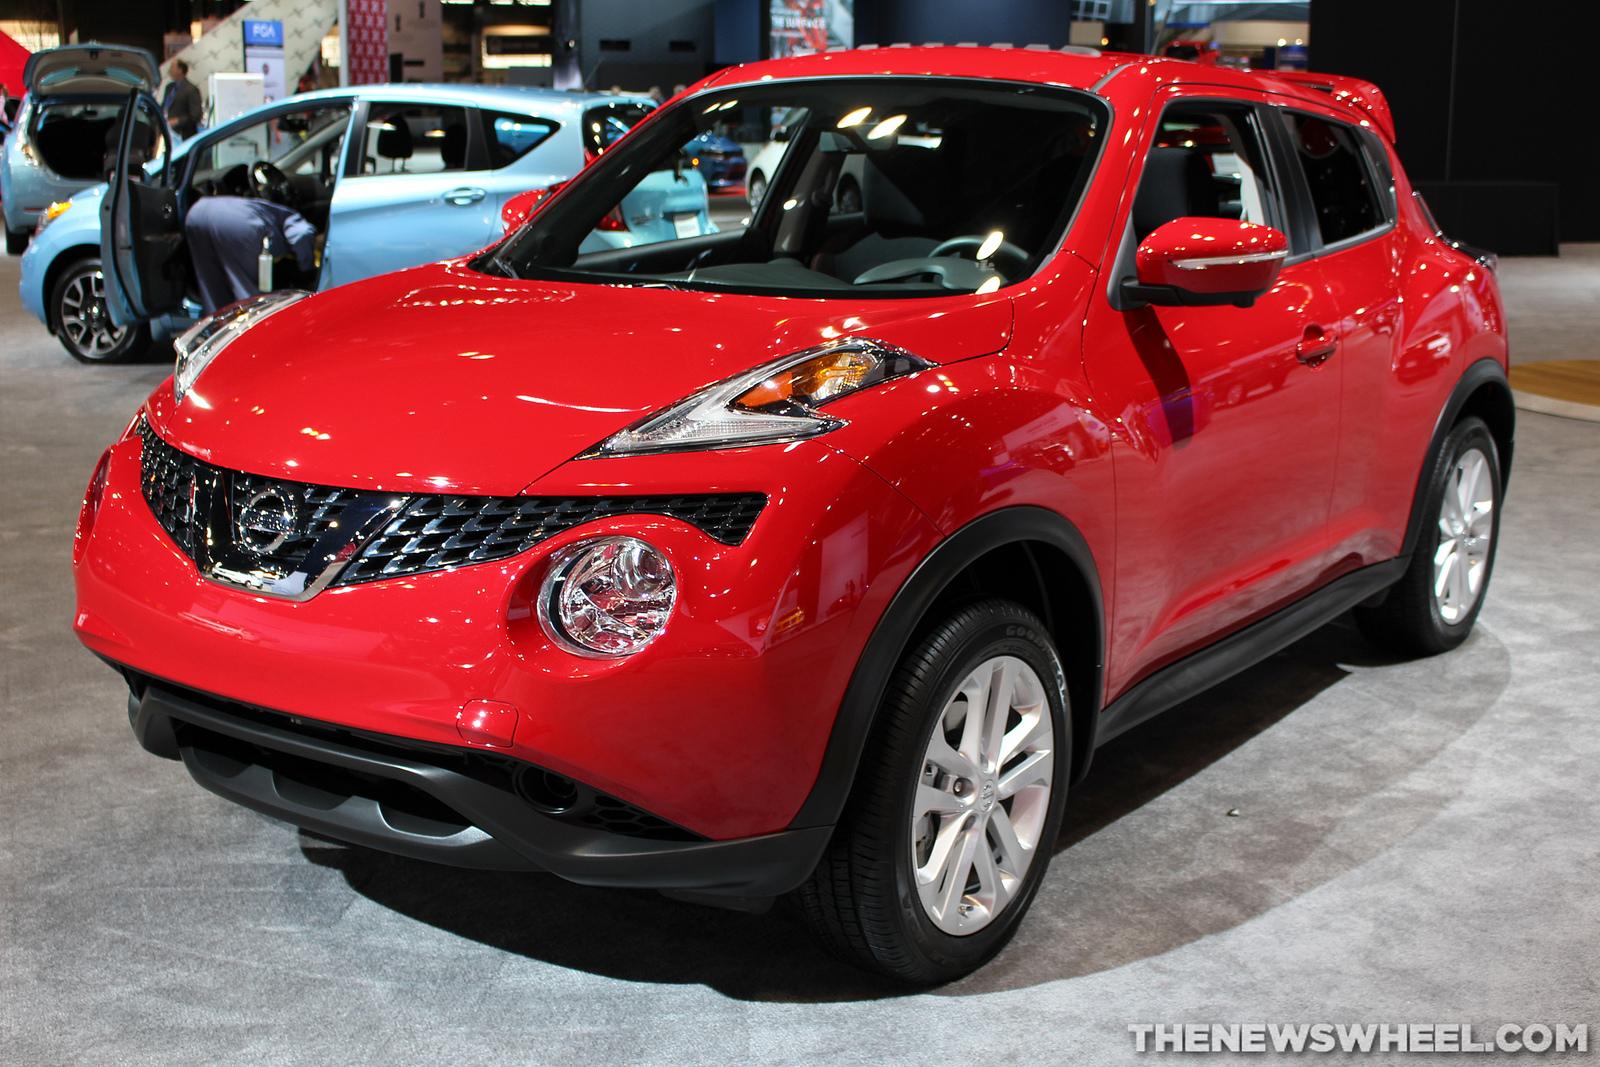 2016 Nissan JUKE Overview The News Wheel